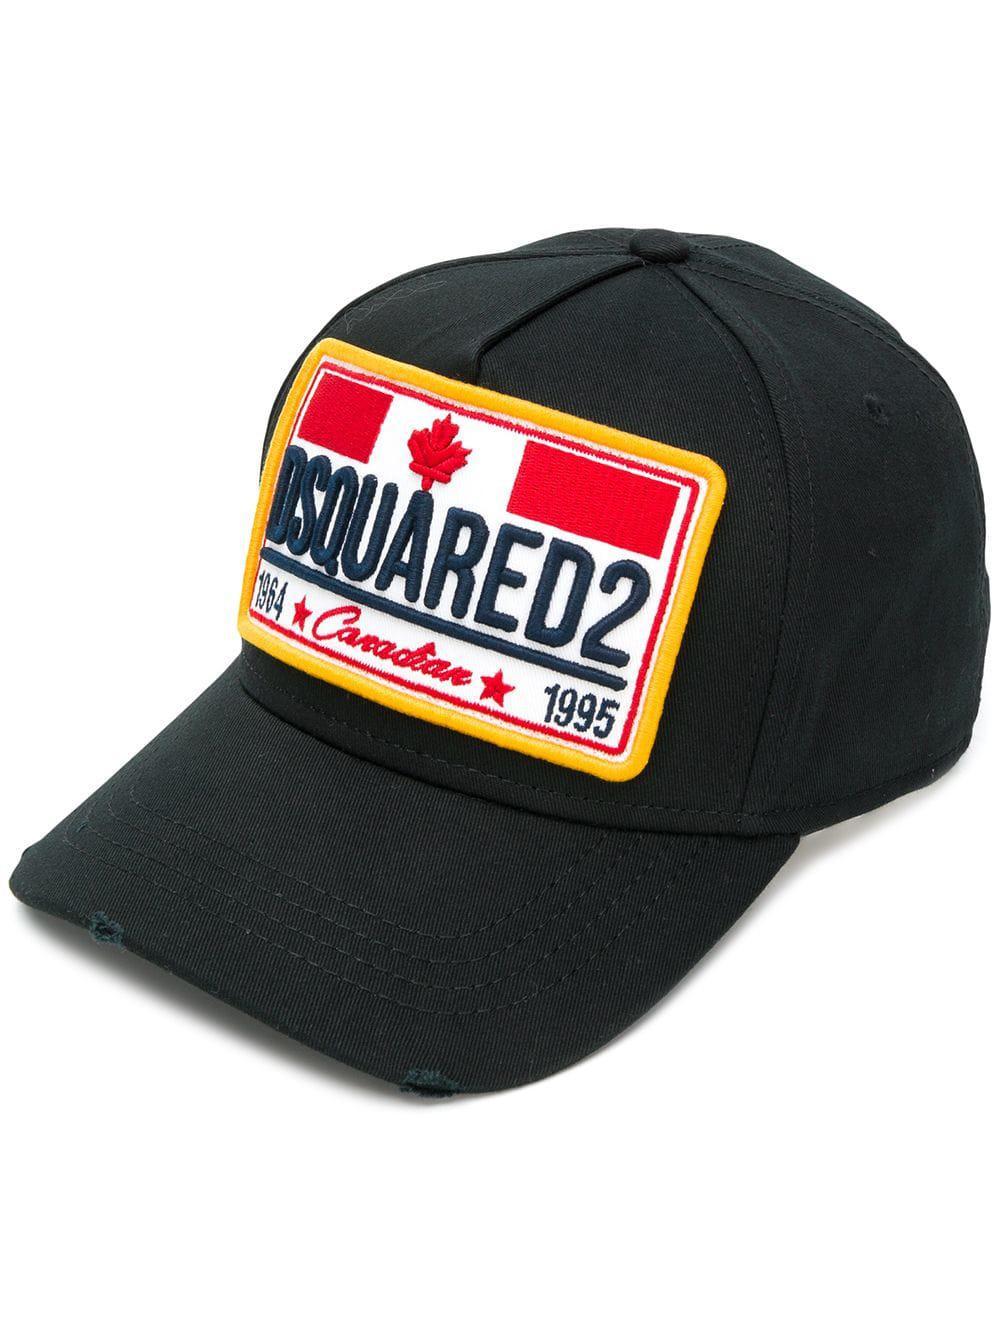 102bcb2dd69 Dsquared² Badge Embroidered Baseball Hat in Black for Men - Save ...